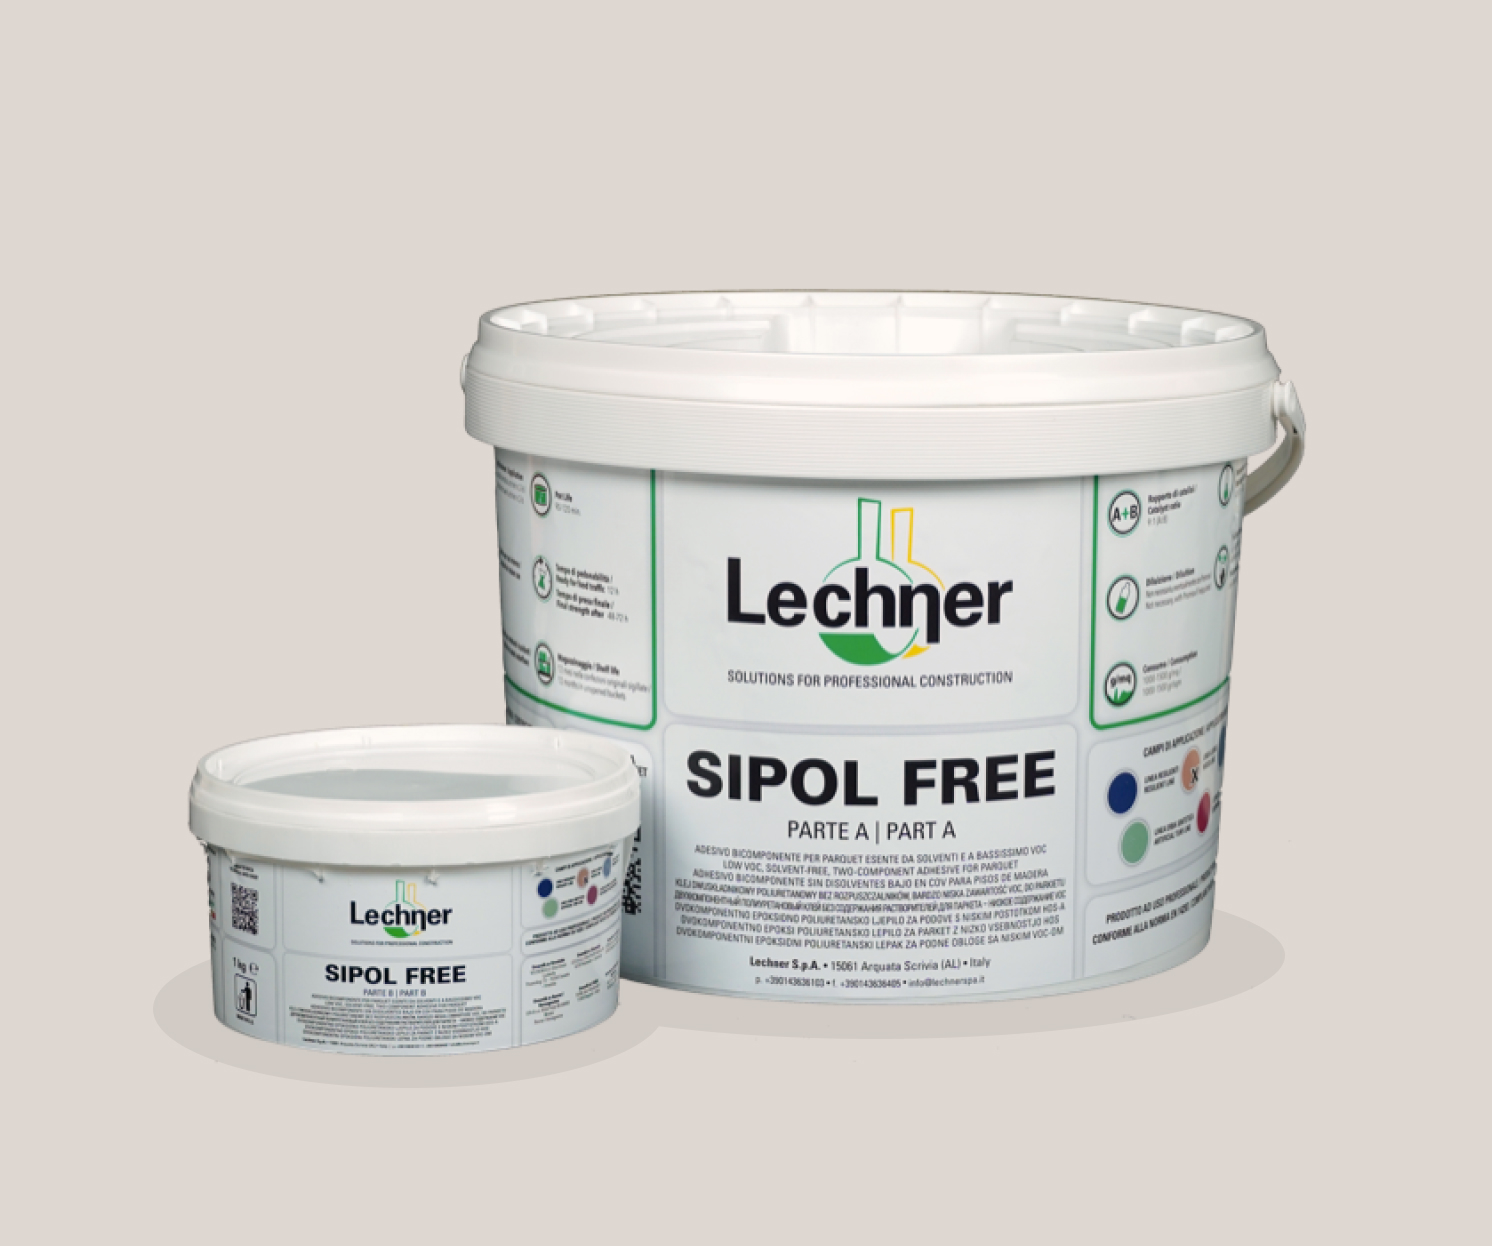 Sipol free - Lechner